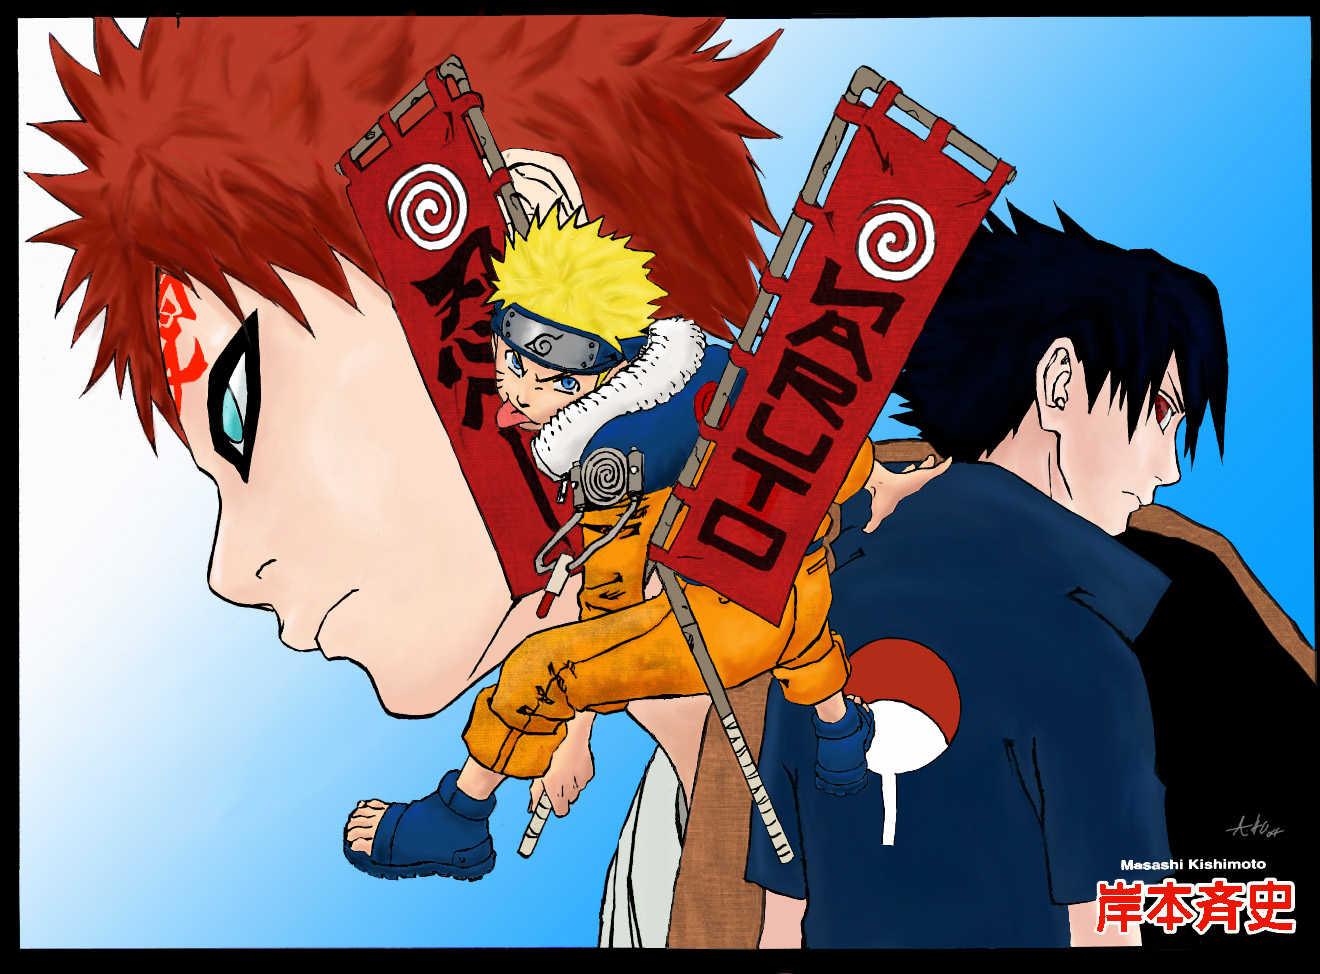 https://im.nineanime.com/comics/pic9/33/289/22538/Naruto2300525.jpg Page 1